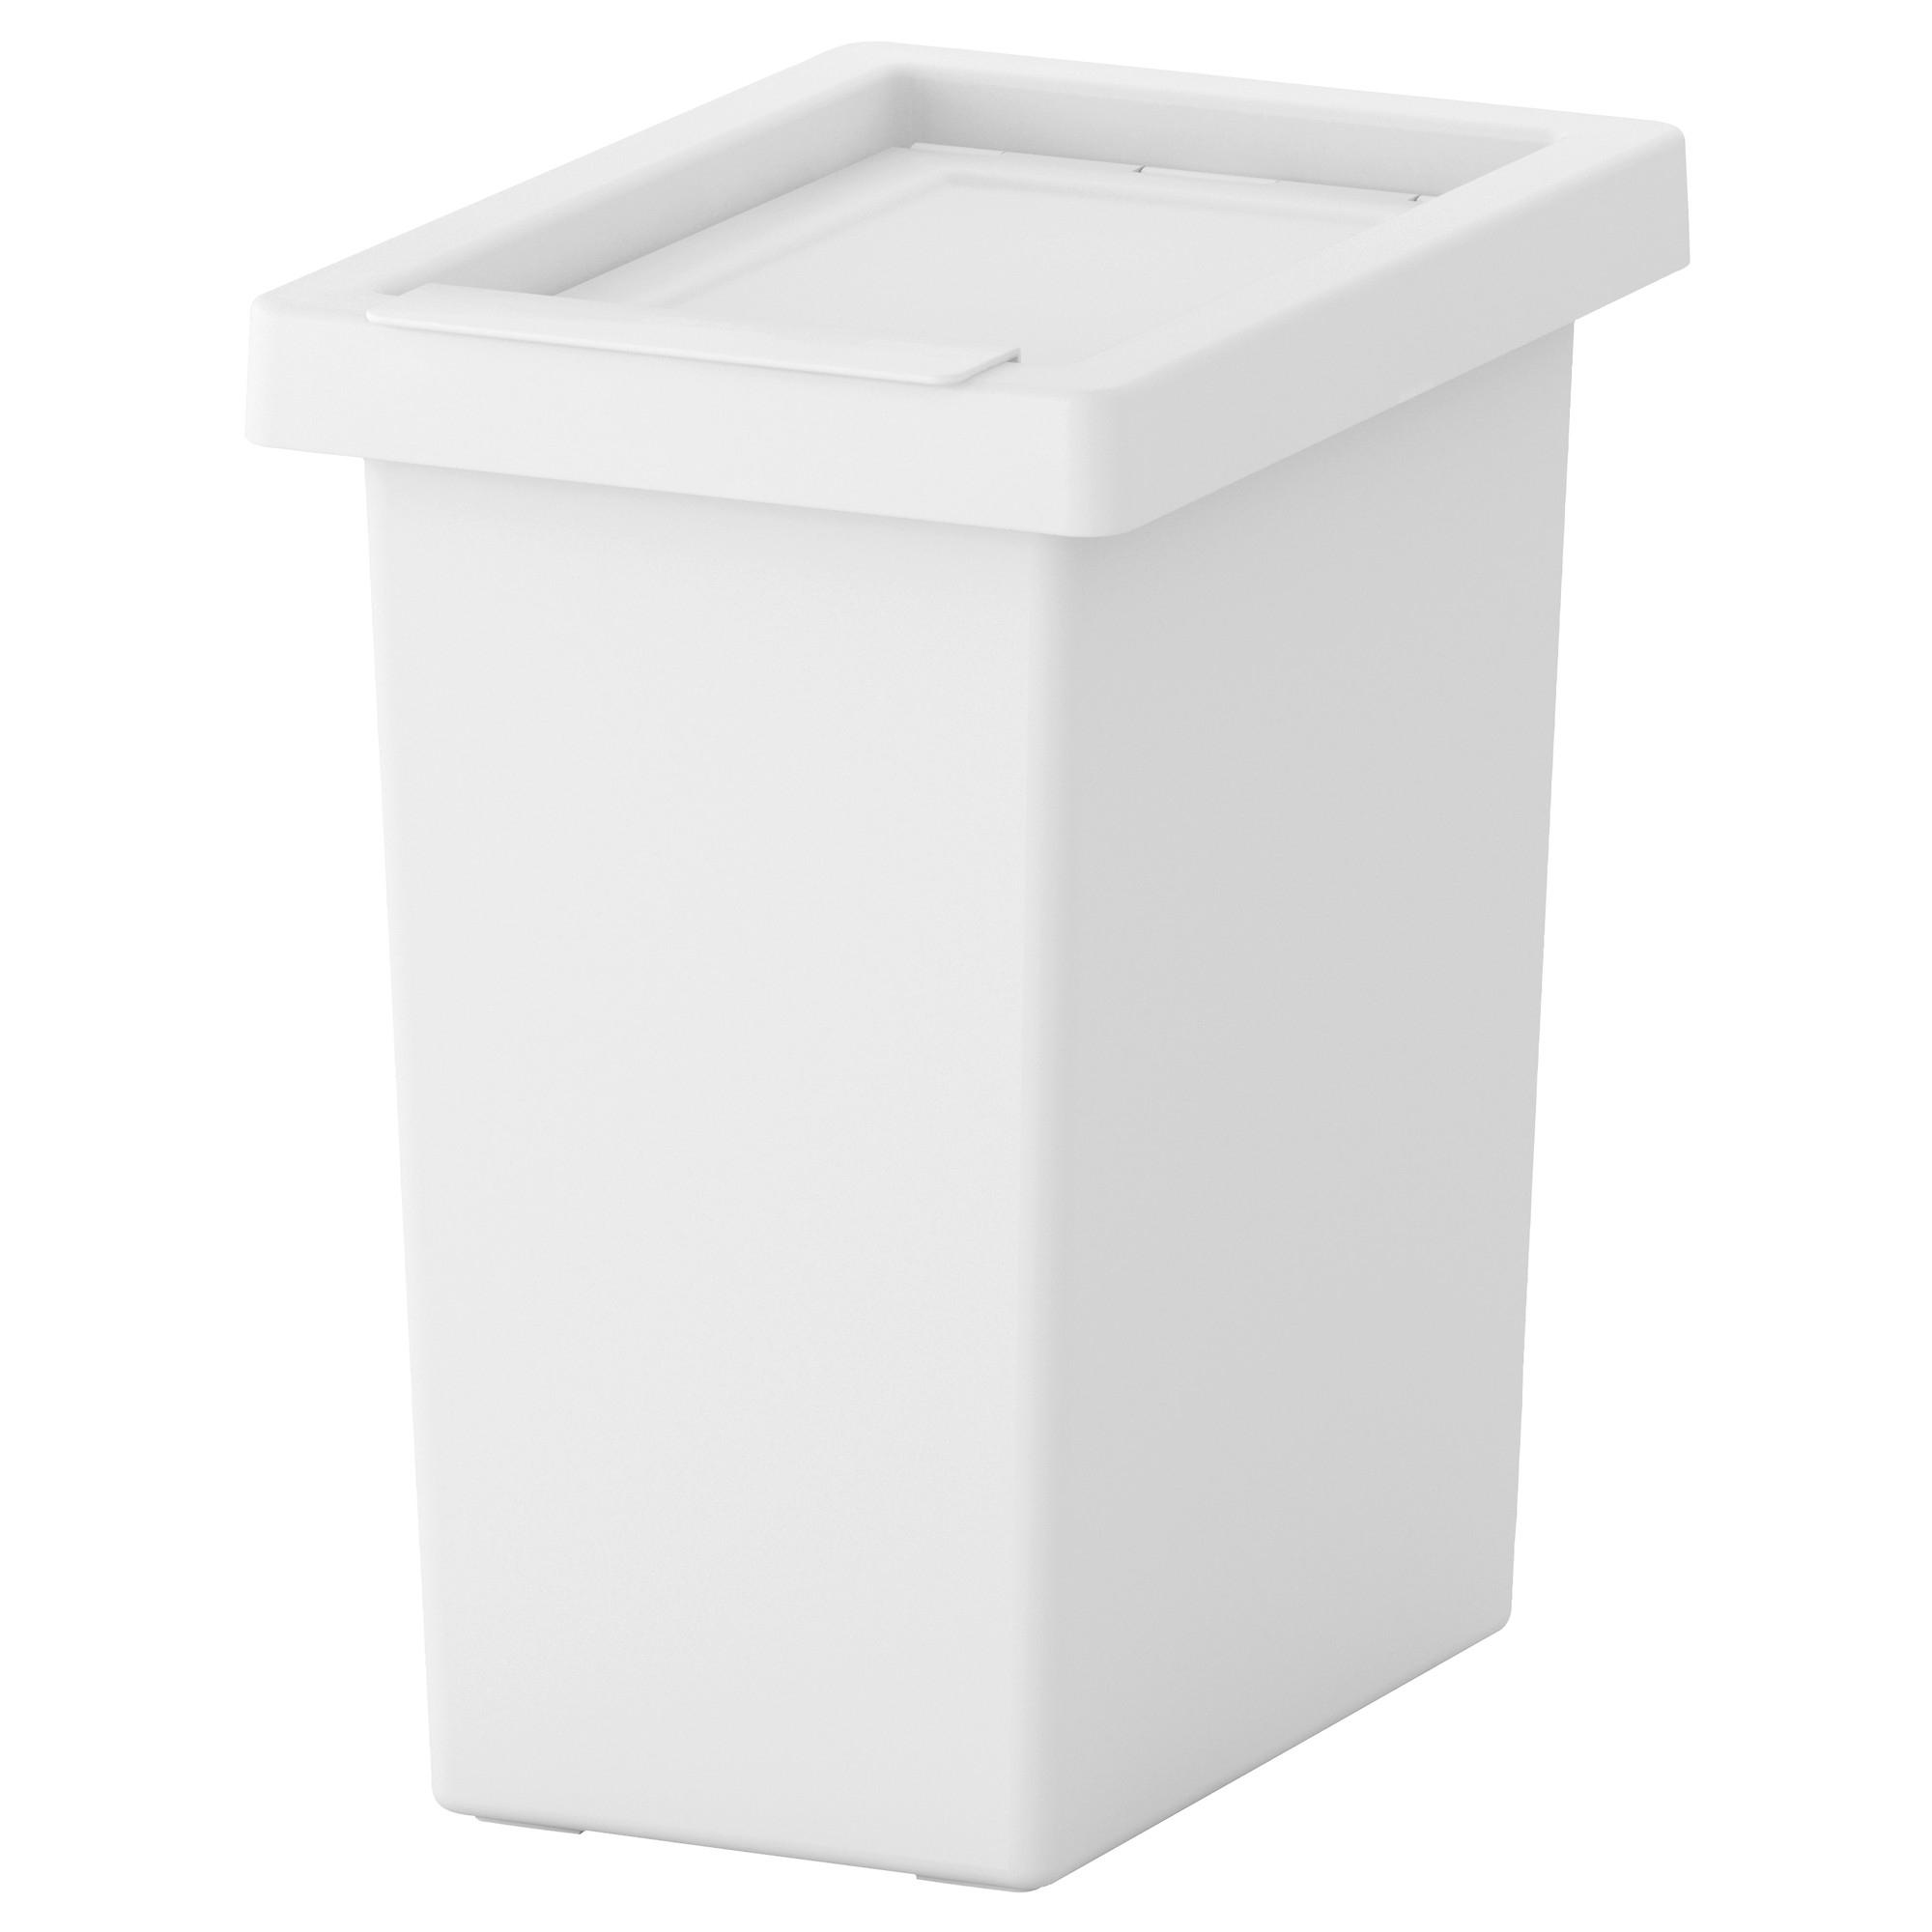 Ikea tenerife detalles producto - Papelera bano ikea ...